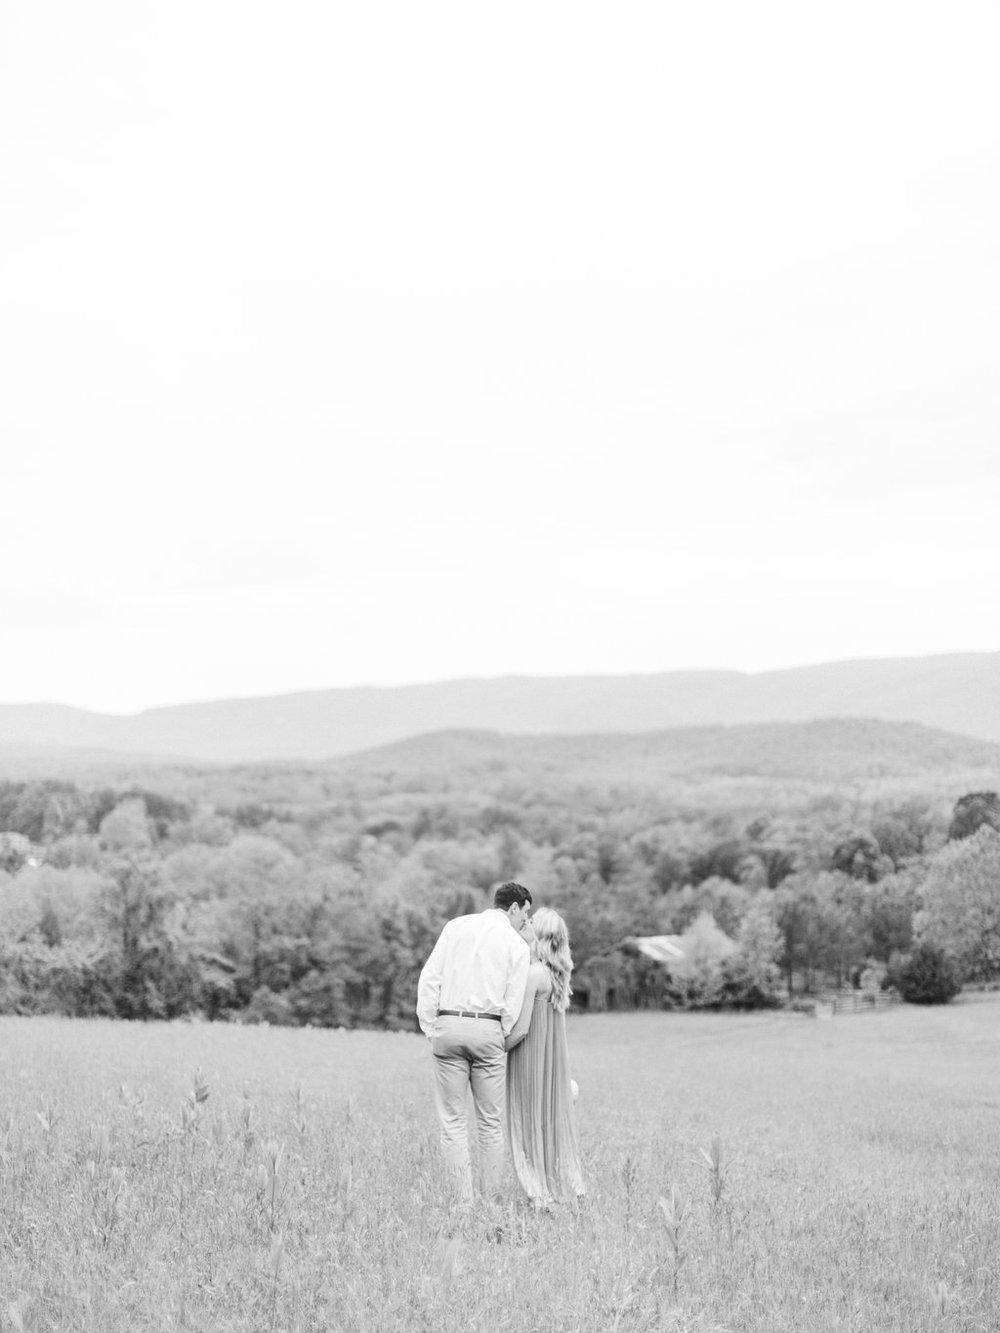 Rachel-May-Photography-5915-48.jpg